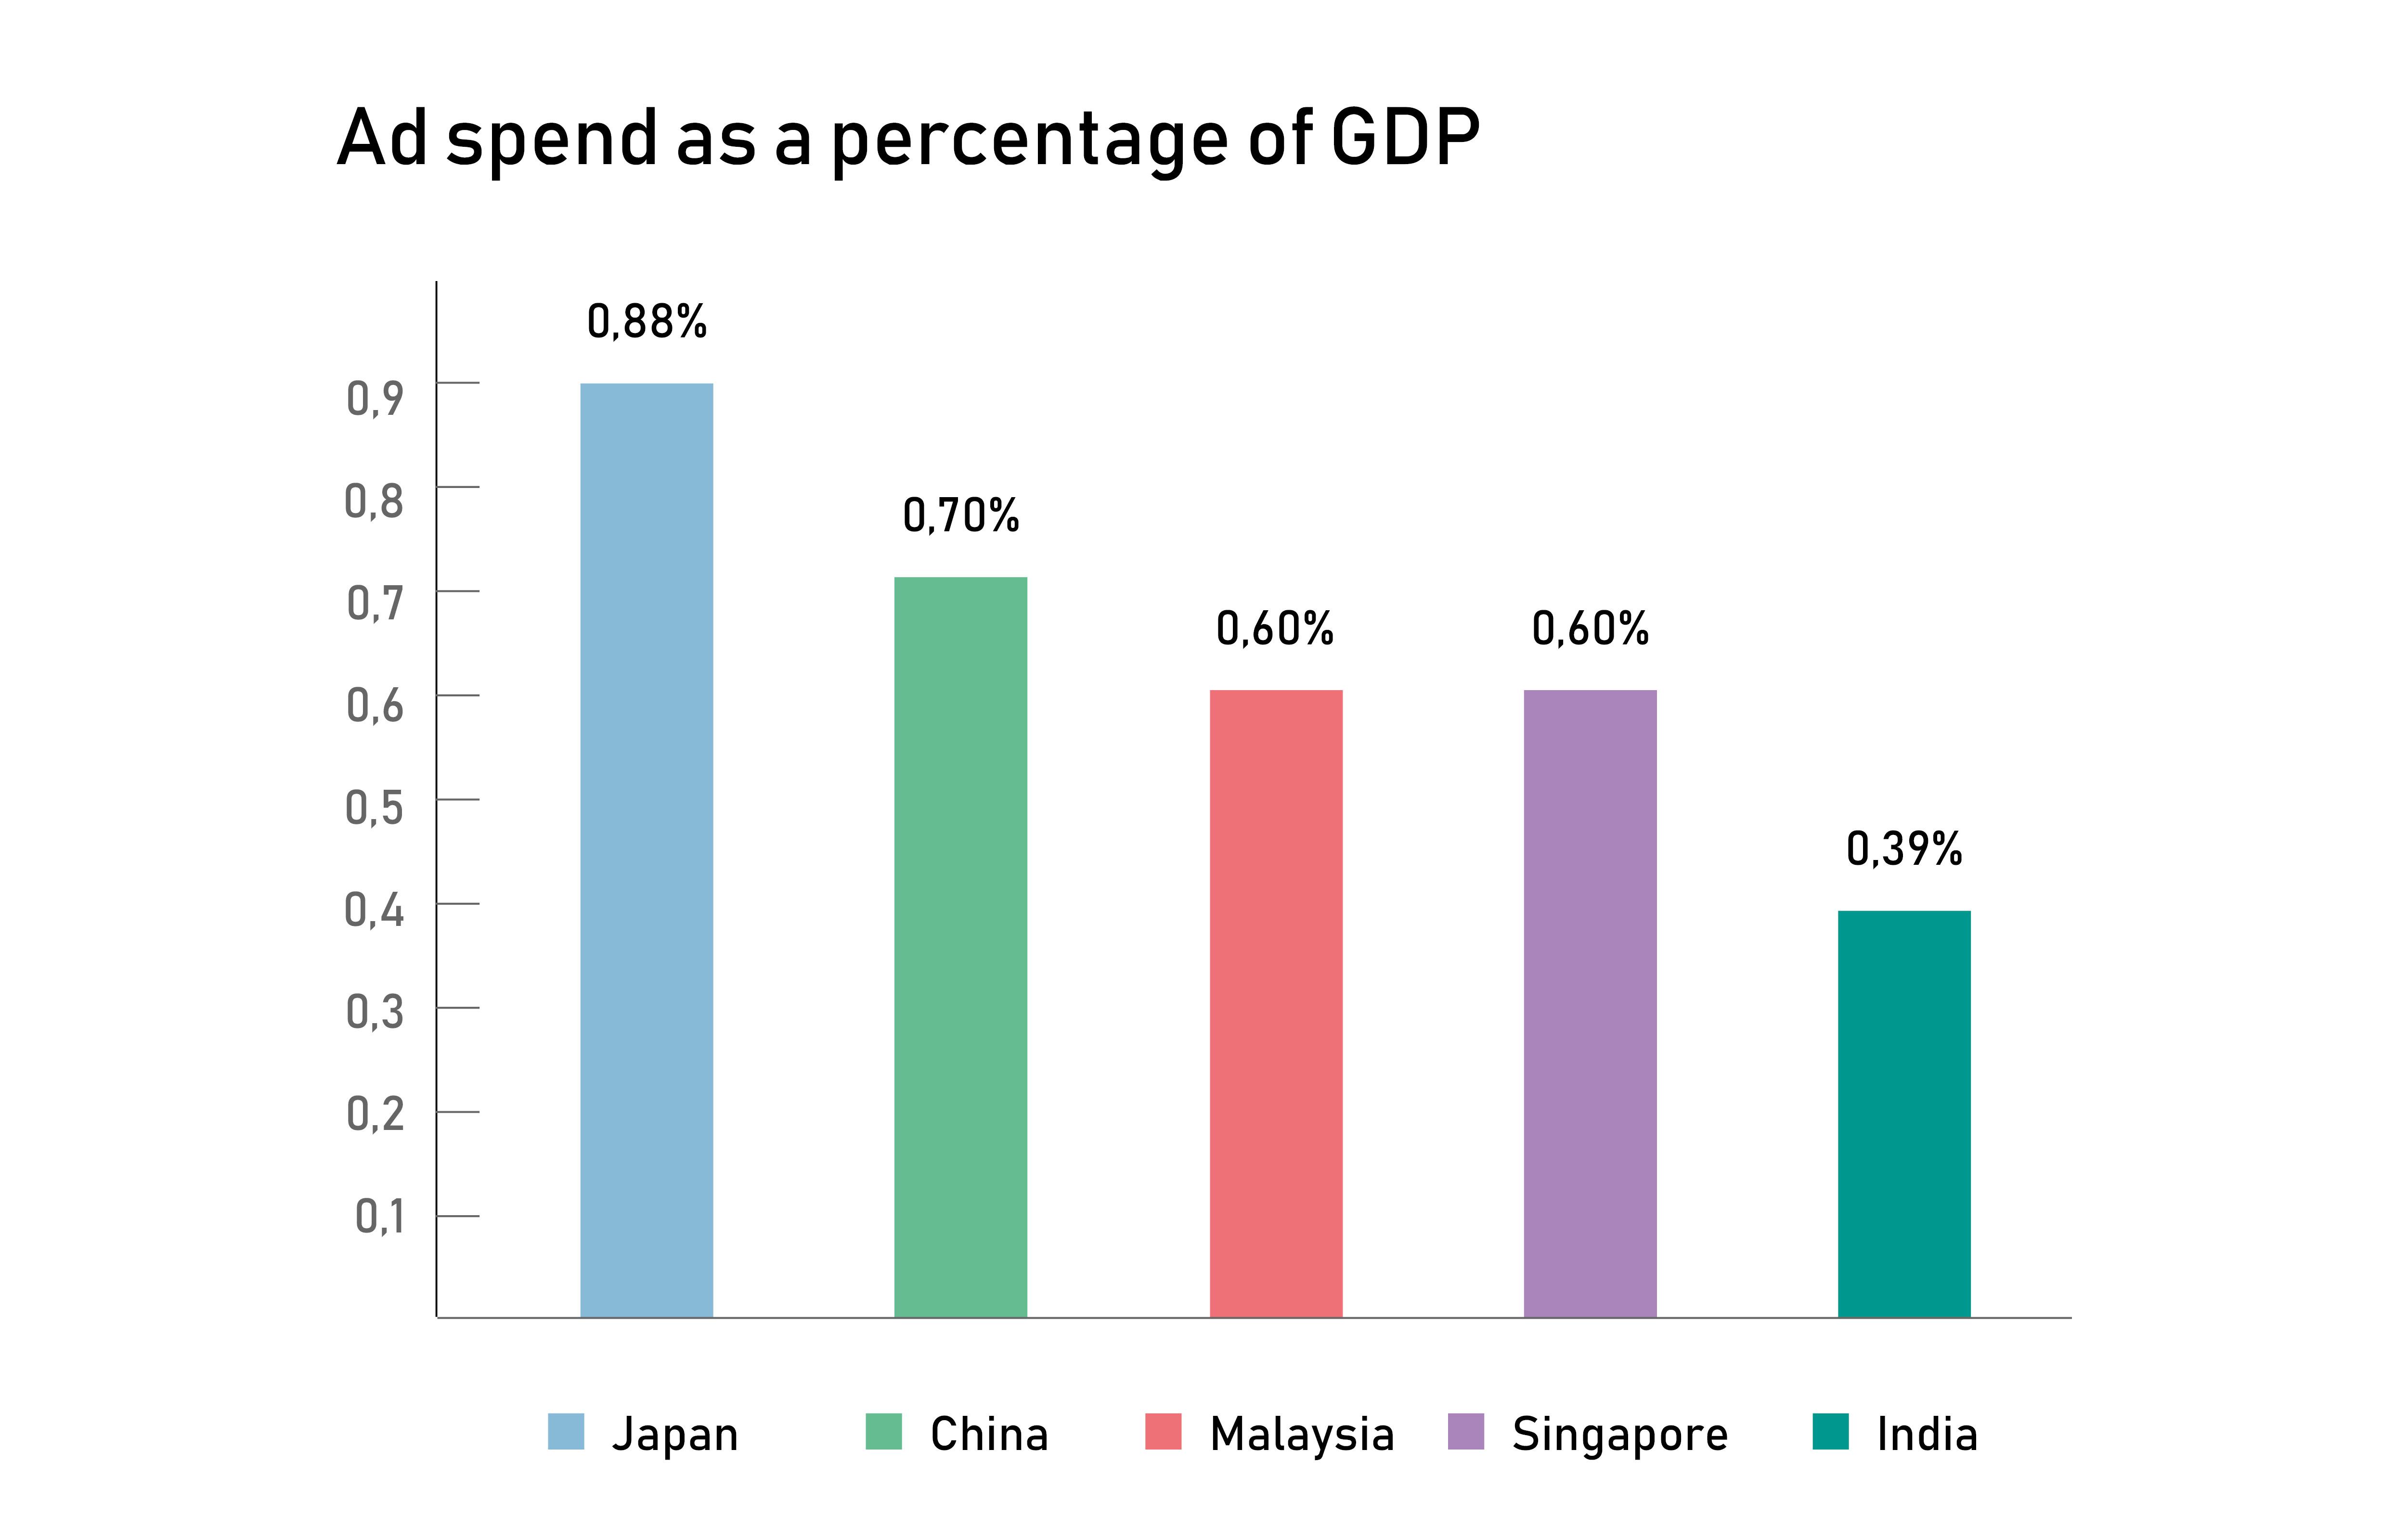 advertising, ROMI, GDP, India, Marketing spend